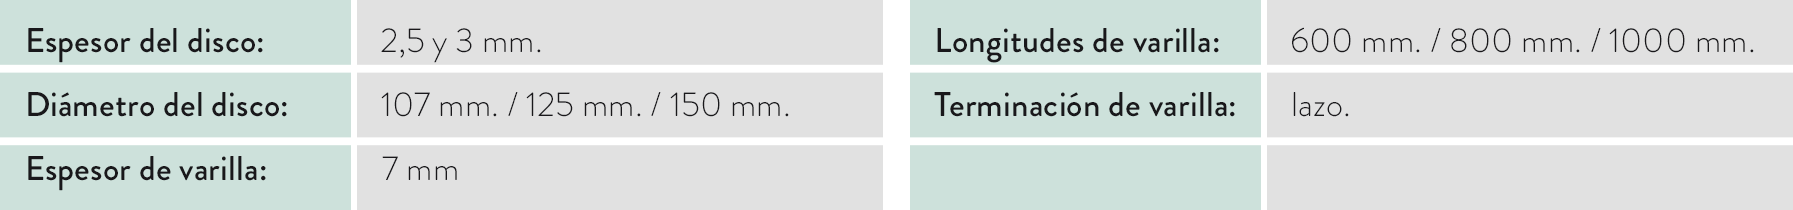 tabla caracteristicas poste lazo